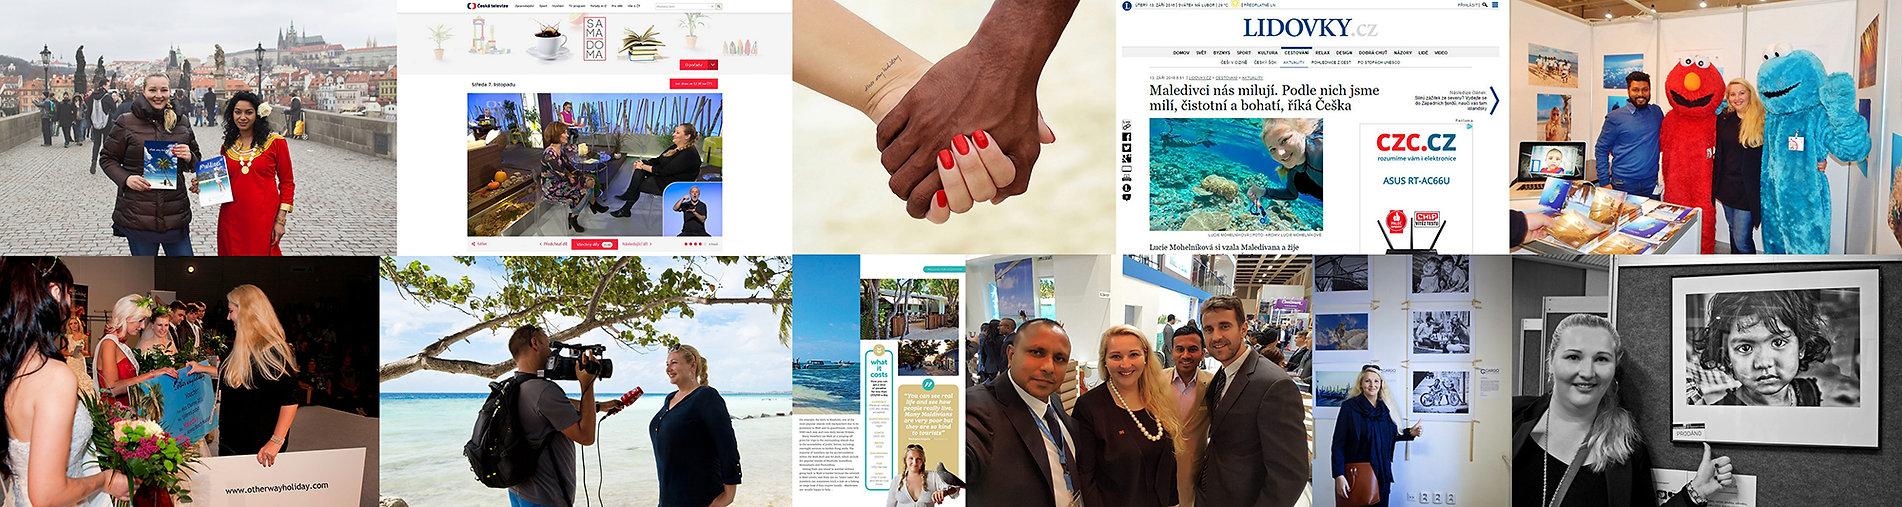 Spolupráce s Atholhu Residence, Fehendhoo, Maledivy